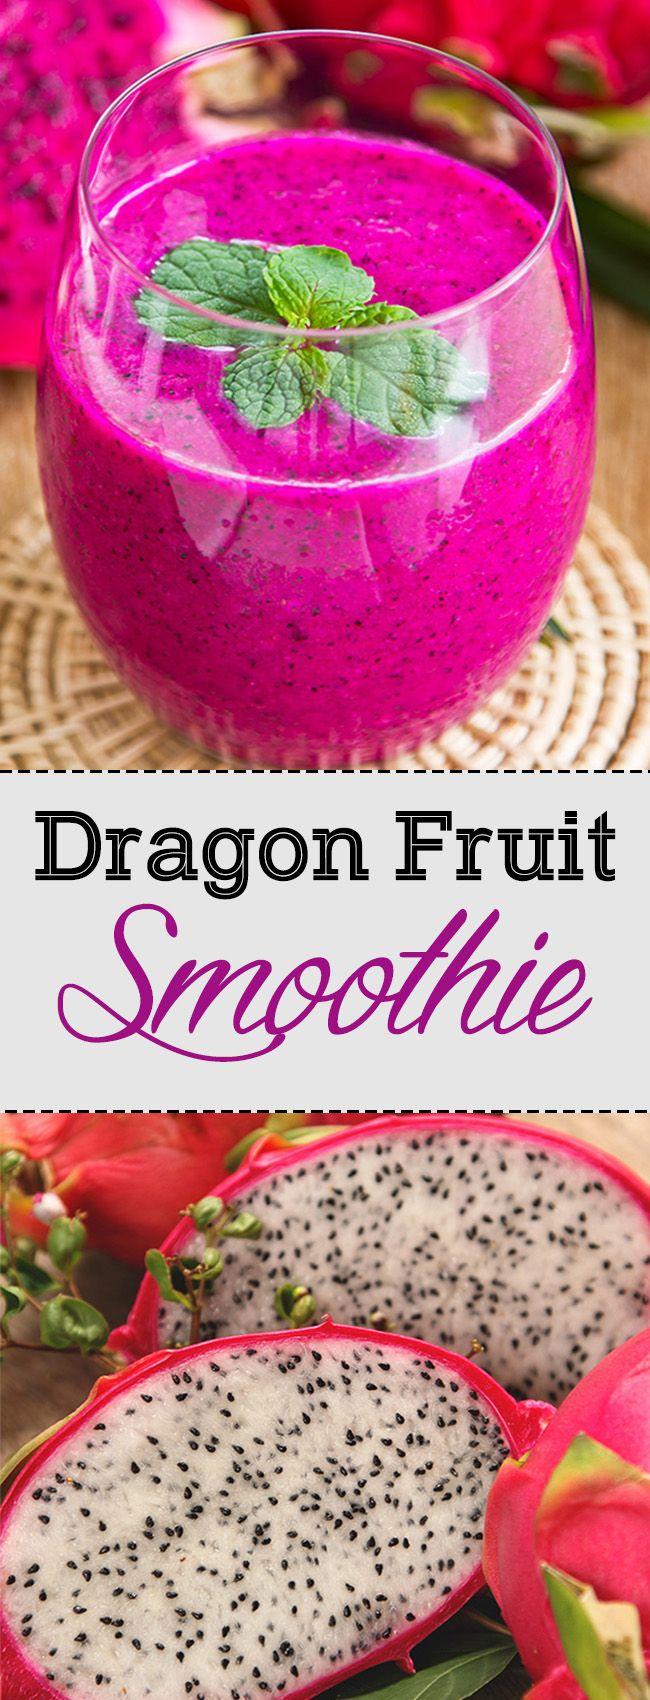 Dragon Fruit for Taste and Health – Fit Body Secret